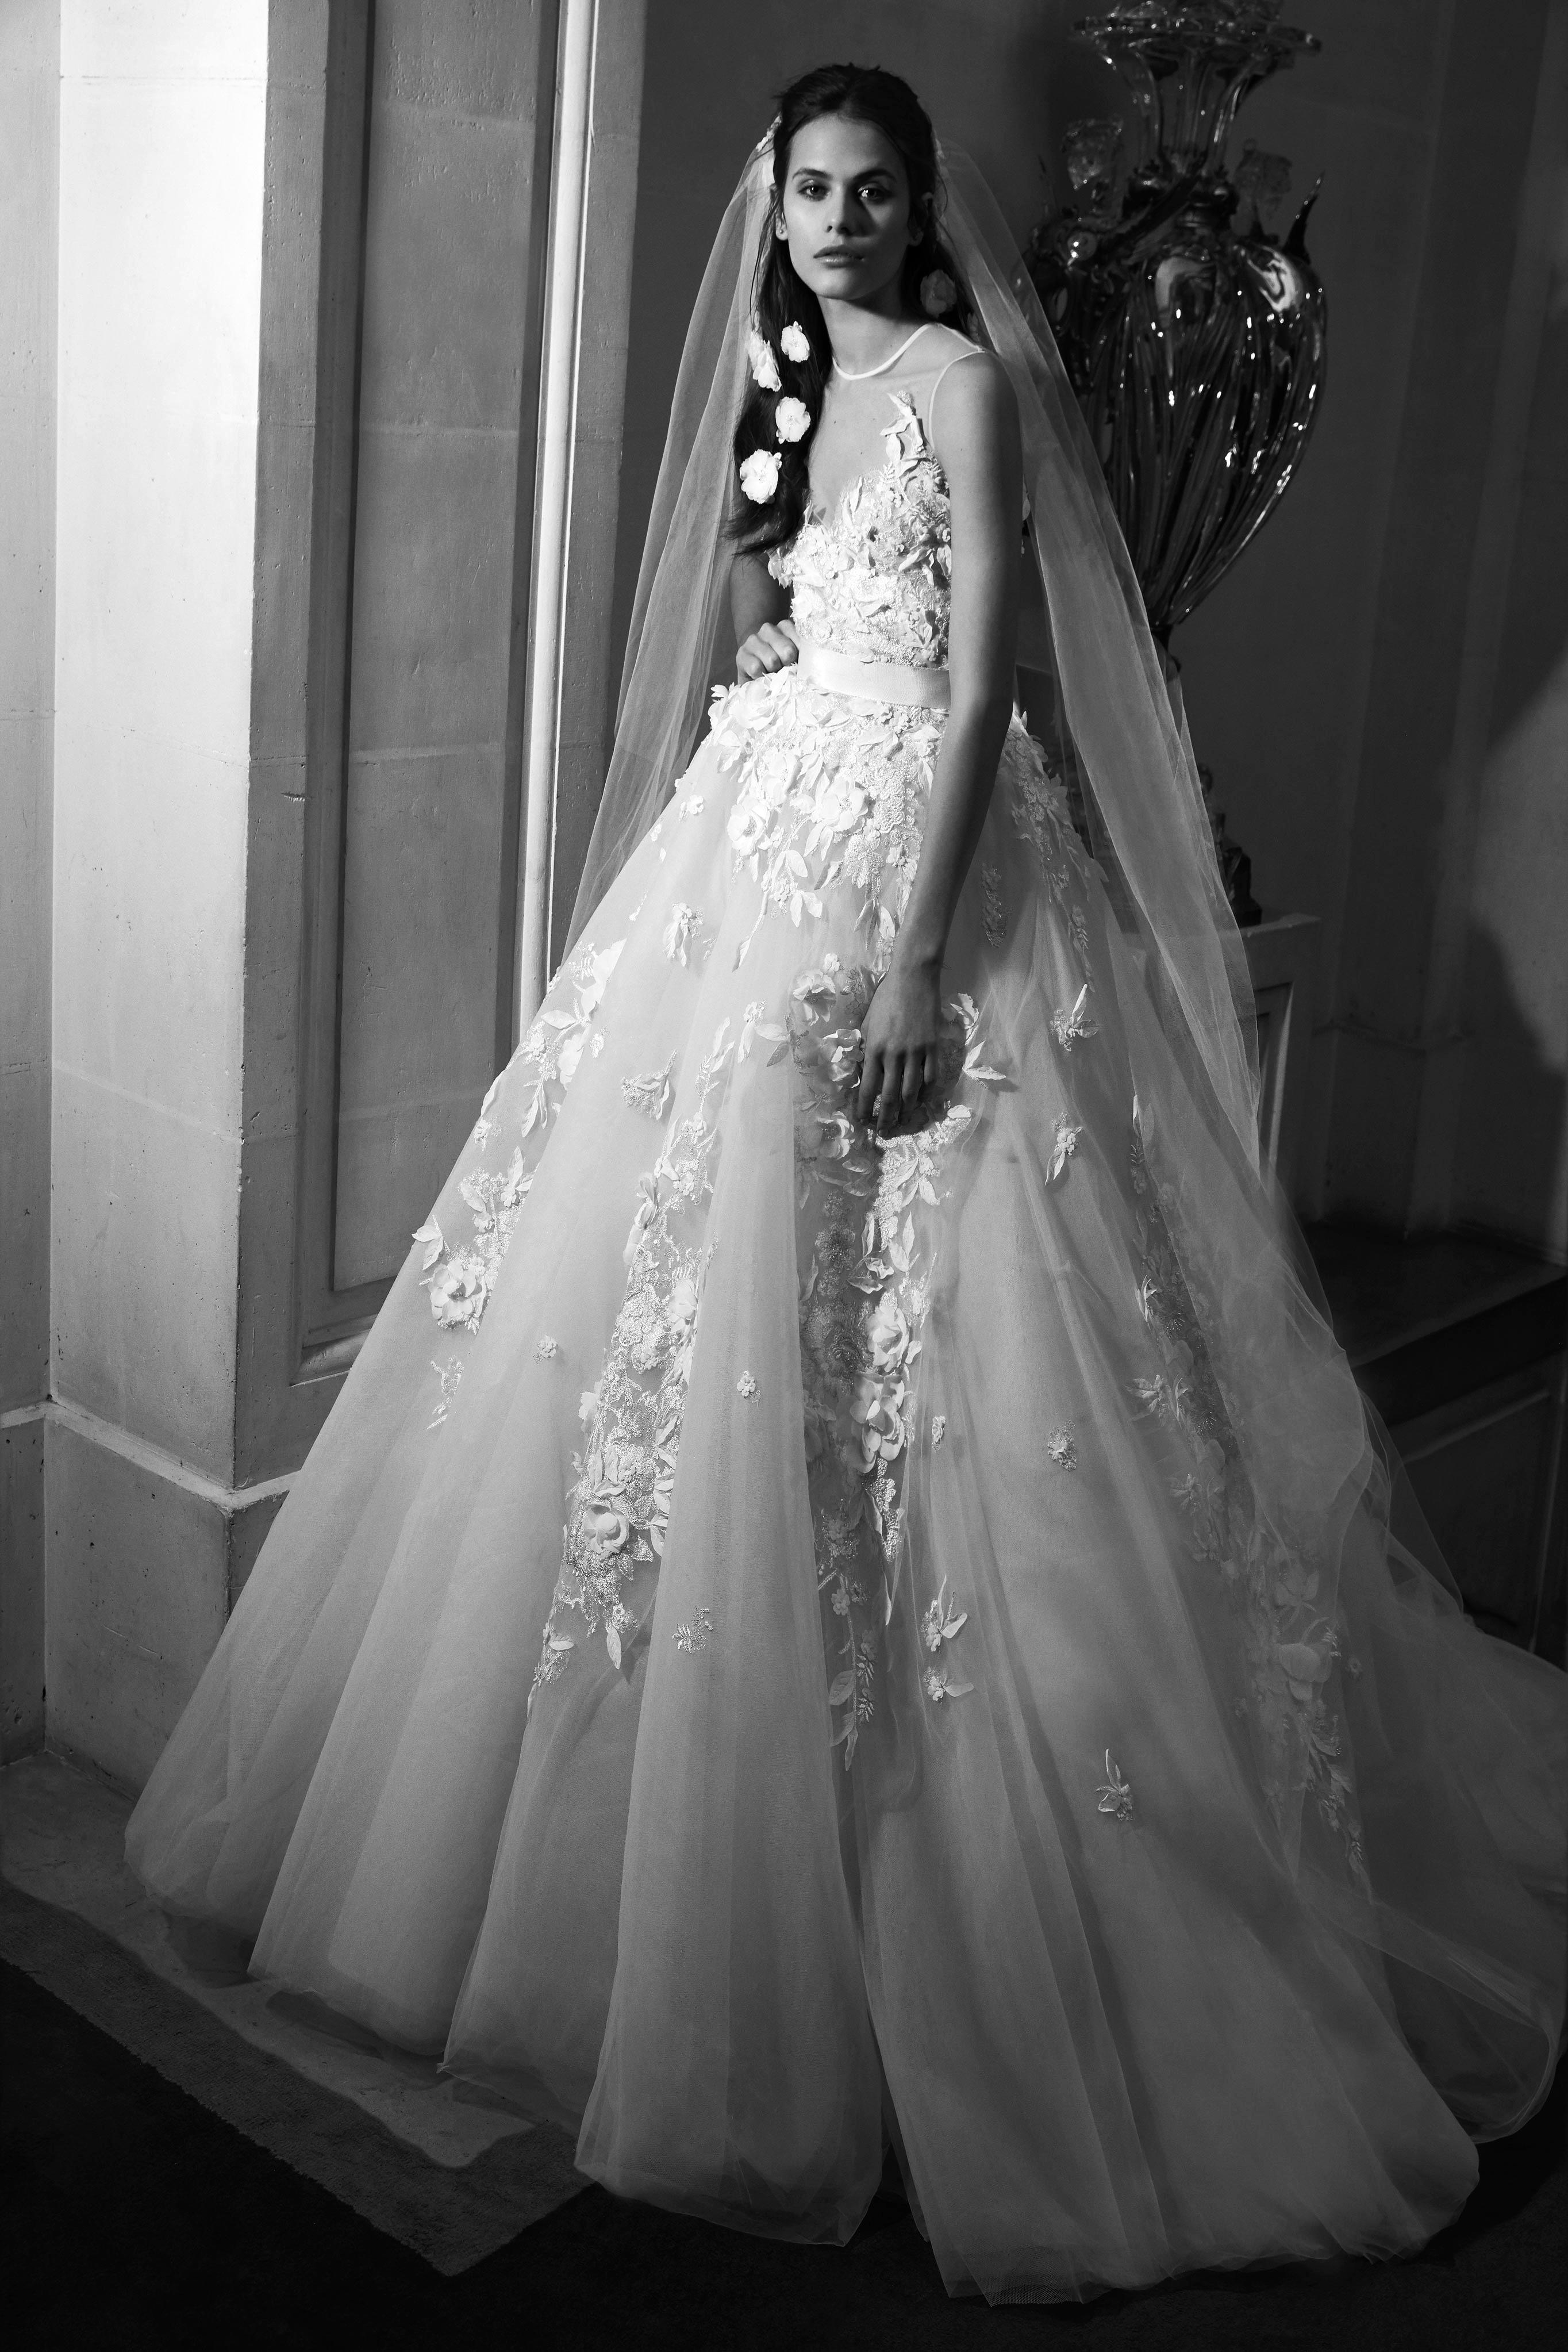 elie saab wedding dress spring 2019 illusion floral embroidery ballgown